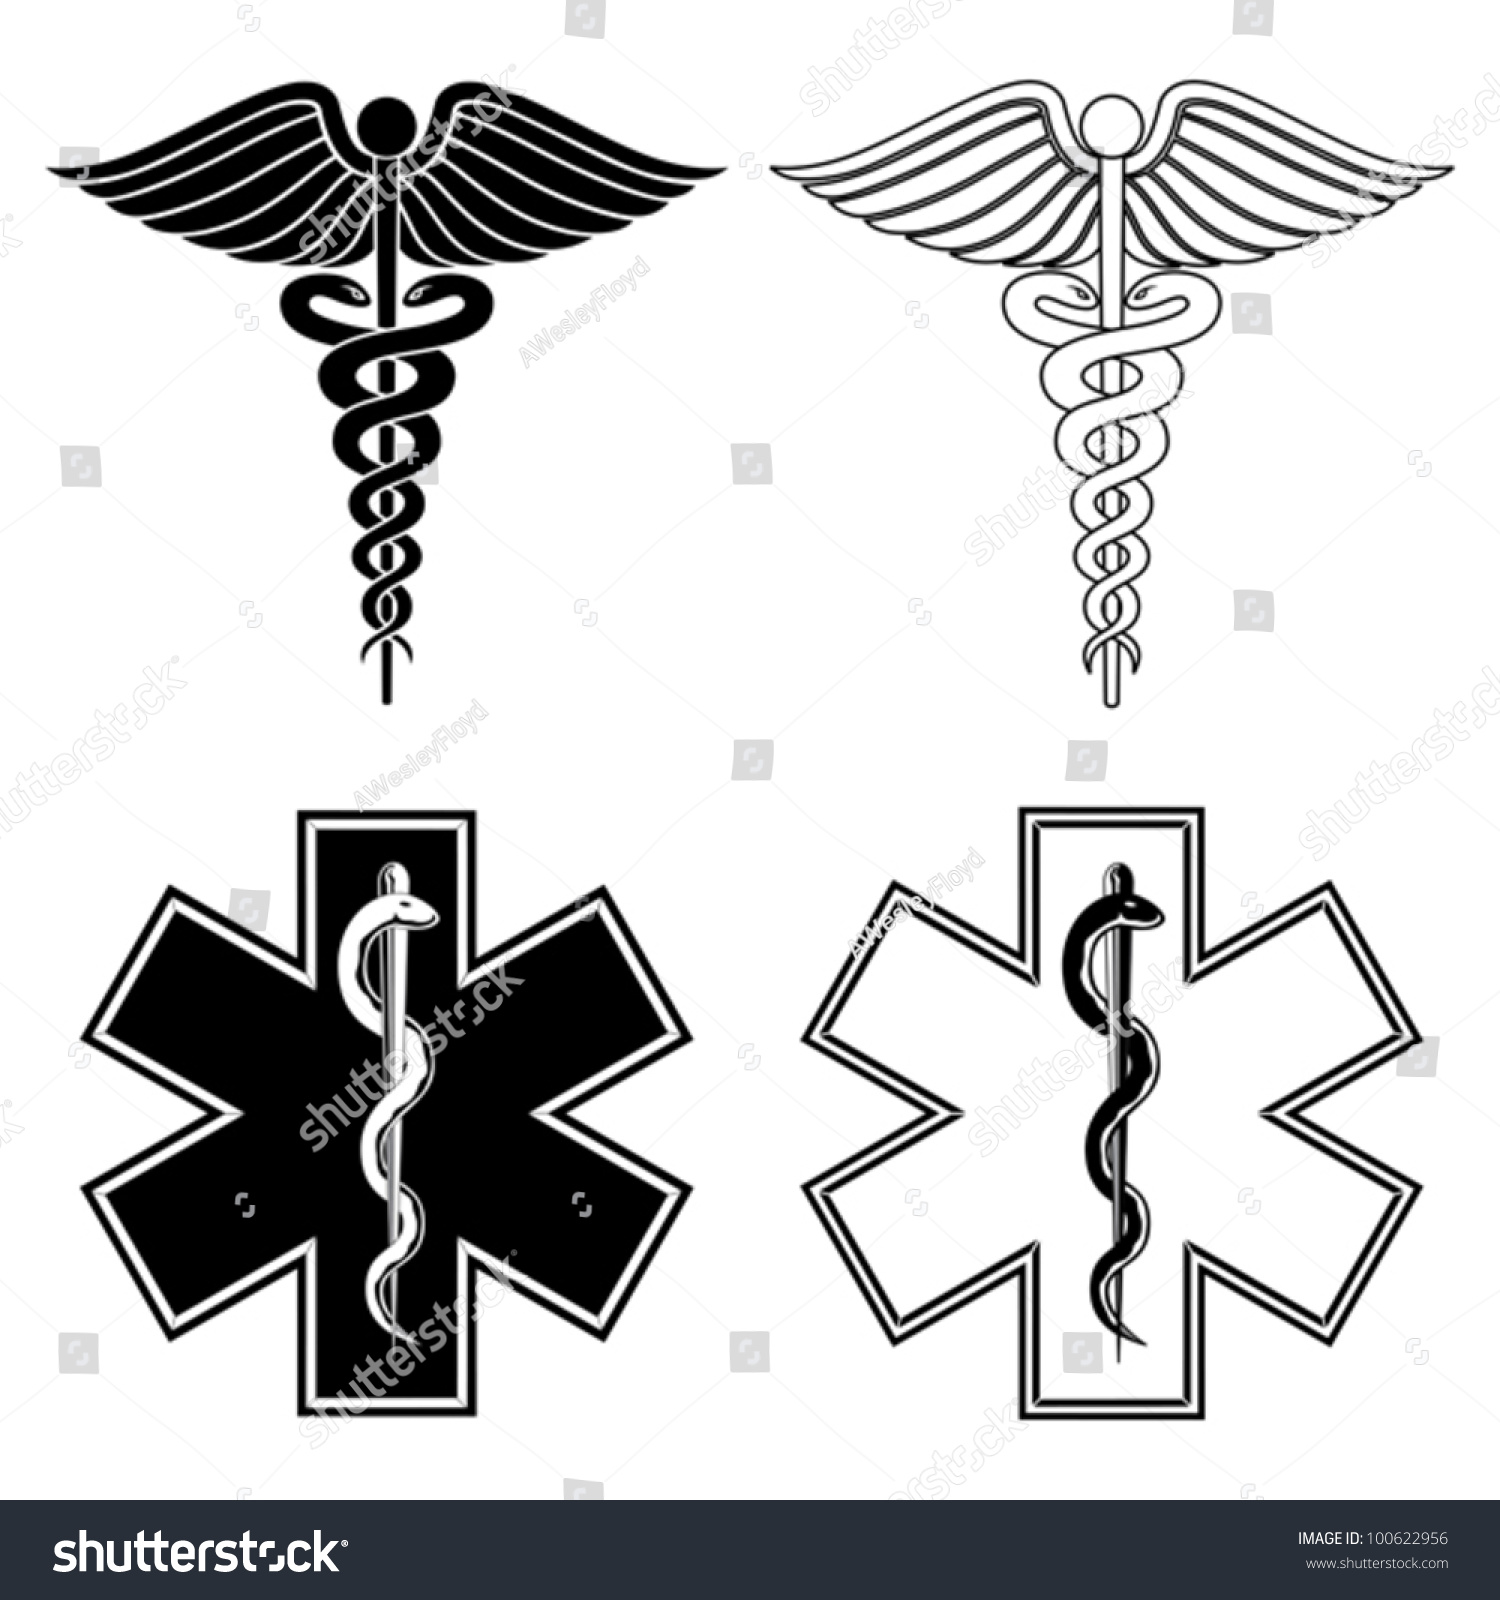 Caduceus Star Life Medical Symbols Illustration Stock Vector